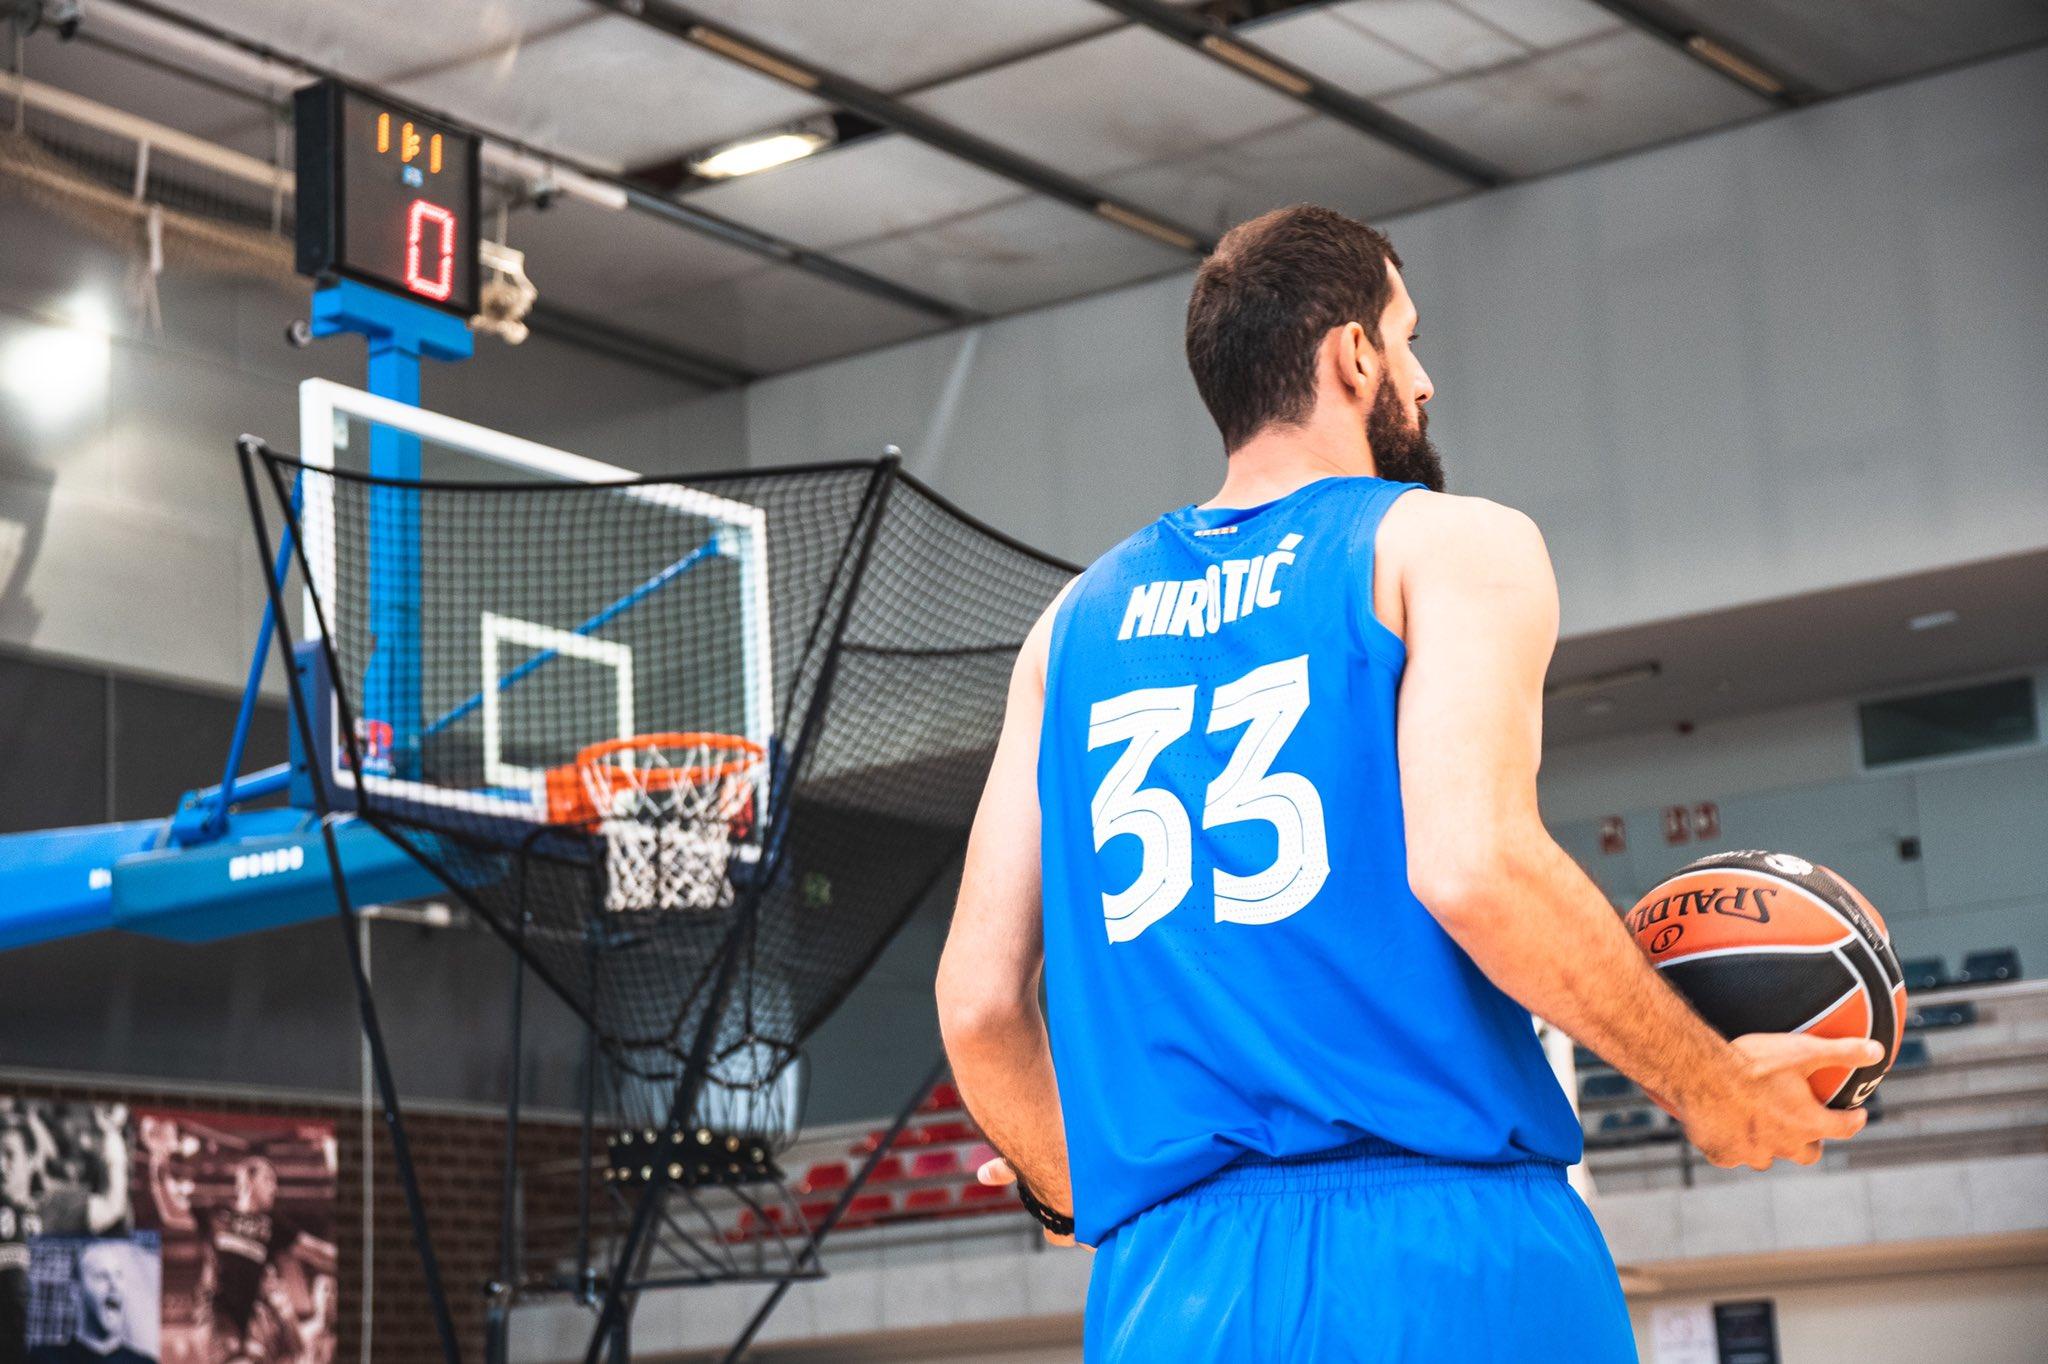 NBA and Euro Basketball Veteran Nikola Mirotic Joins the Dr. Dish Fam